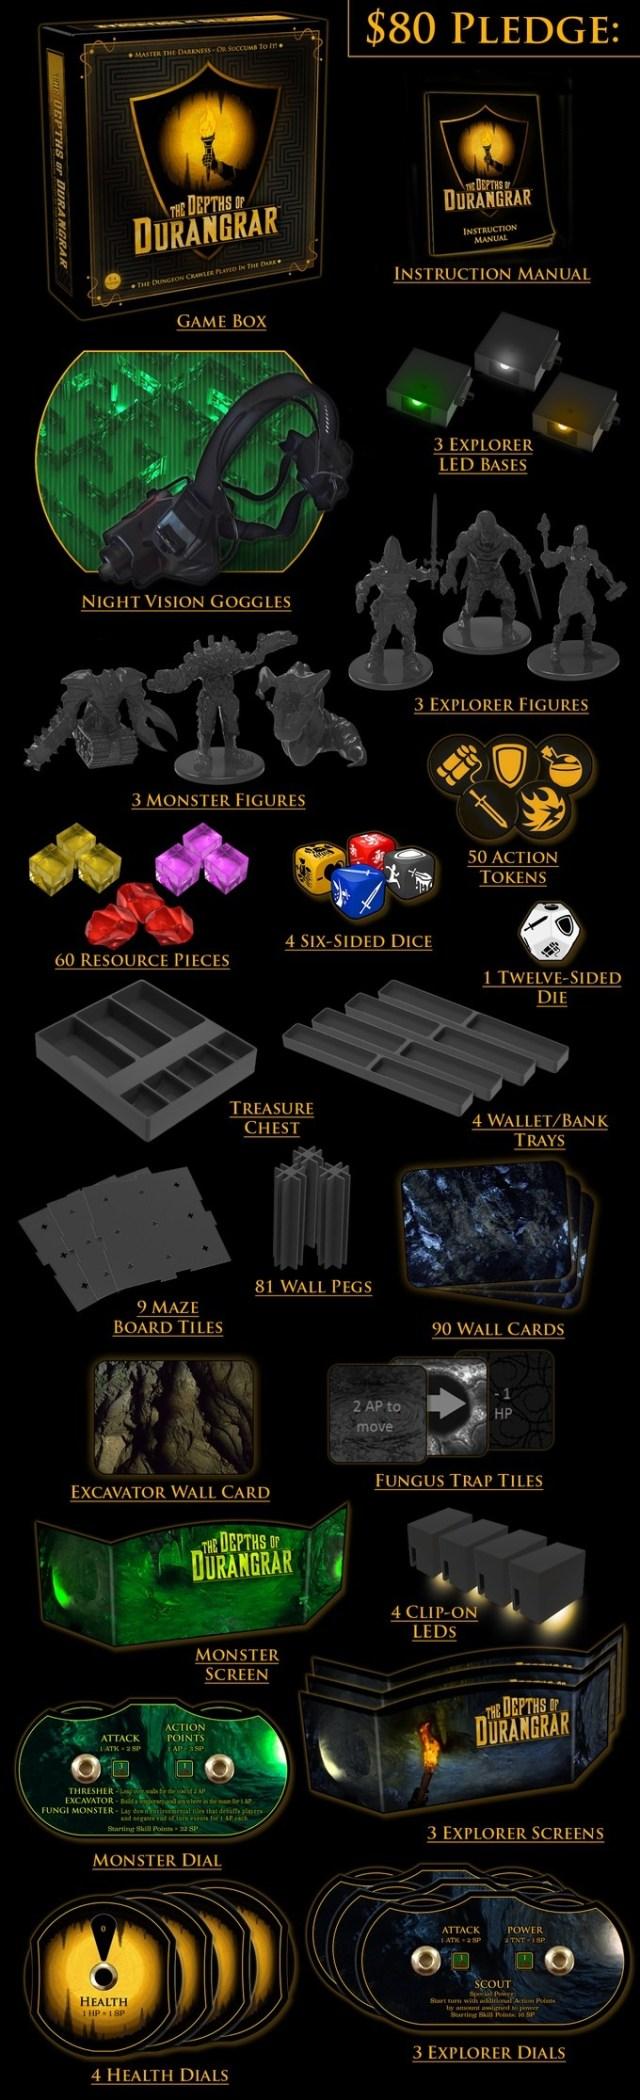 The Depths of Durangrar: A Dungeon Crawler...in the dark